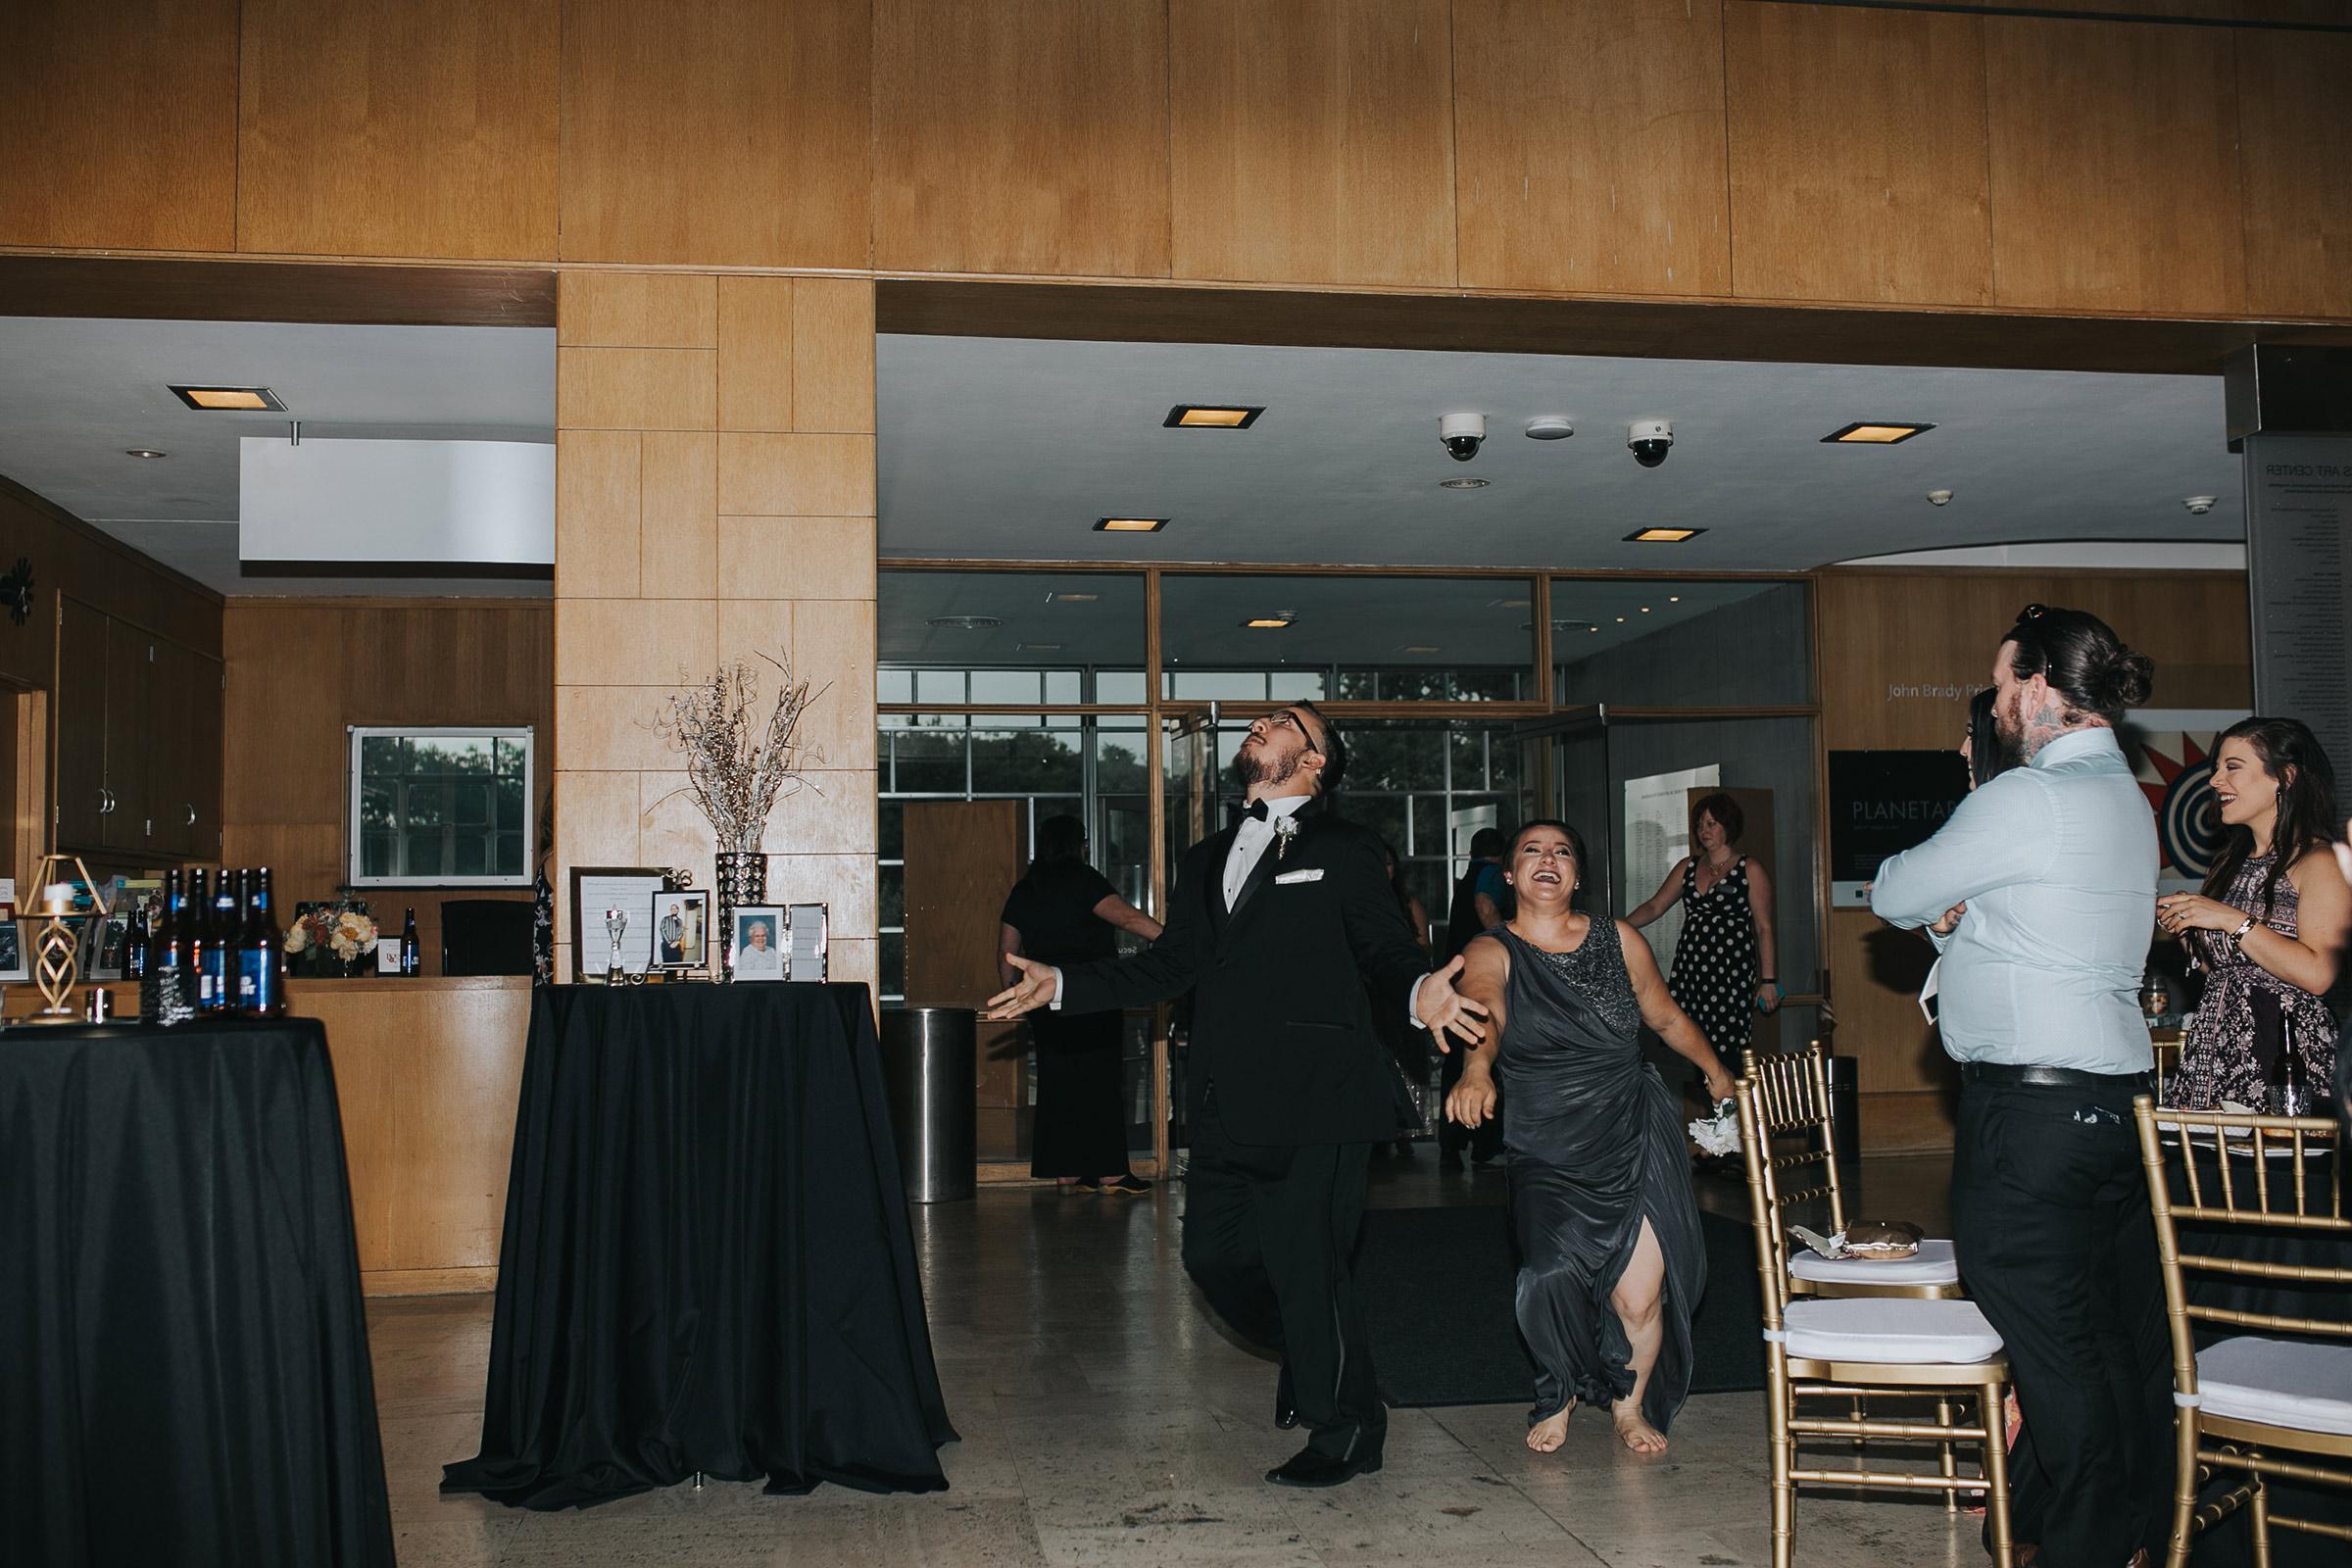 bridesmaids-and-groomsmen-grand-enterance-having-fun-desmoines-iowa-art-center-raelyn-ramey-photography.jpg